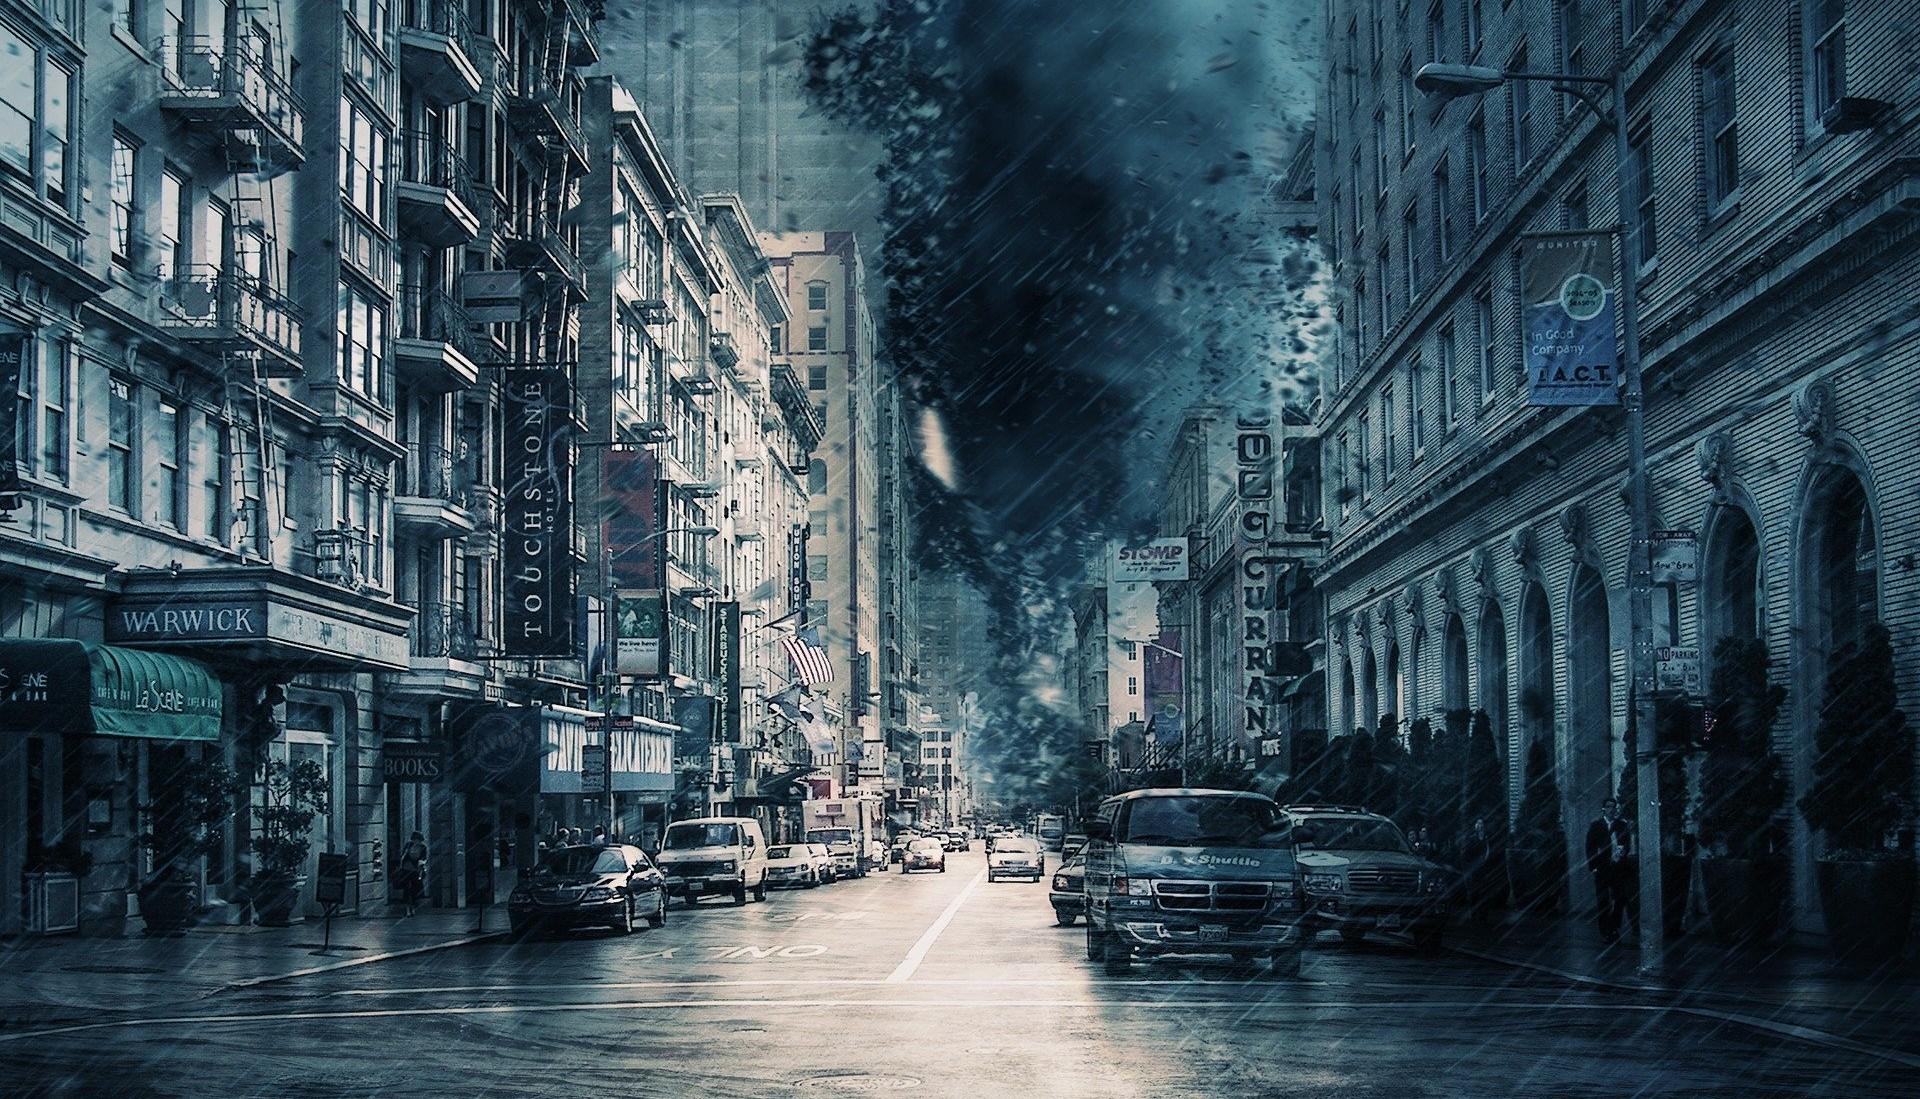 storm-2567670_1920